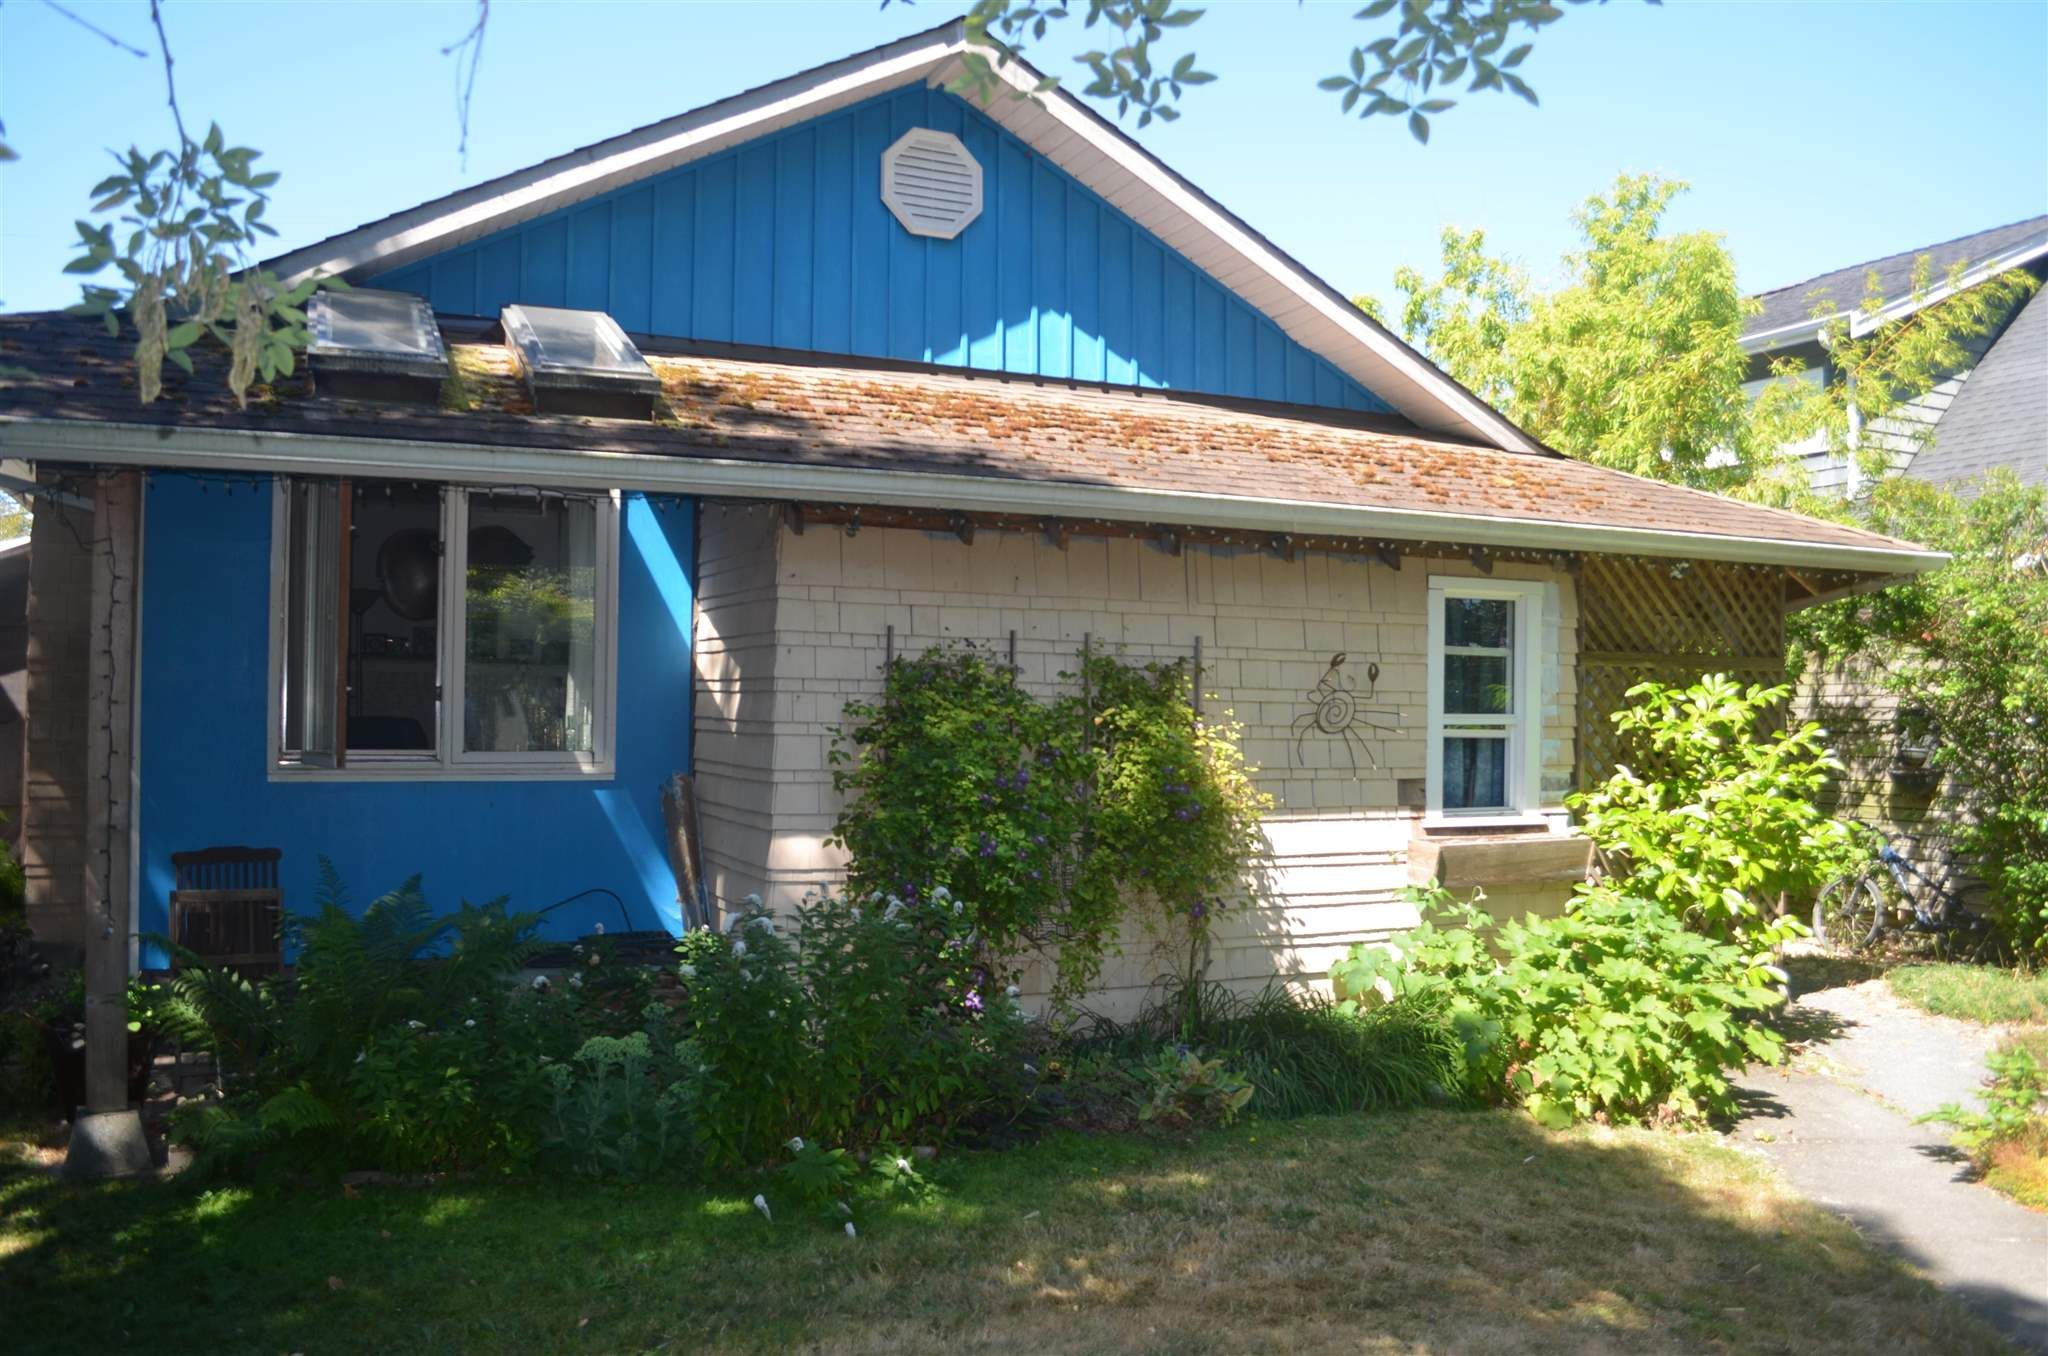 Main Photo: 2801 GORDON Avenue in Surrey: Crescent Bch Ocean Pk. House for sale (South Surrey White Rock)  : MLS®# R2603059